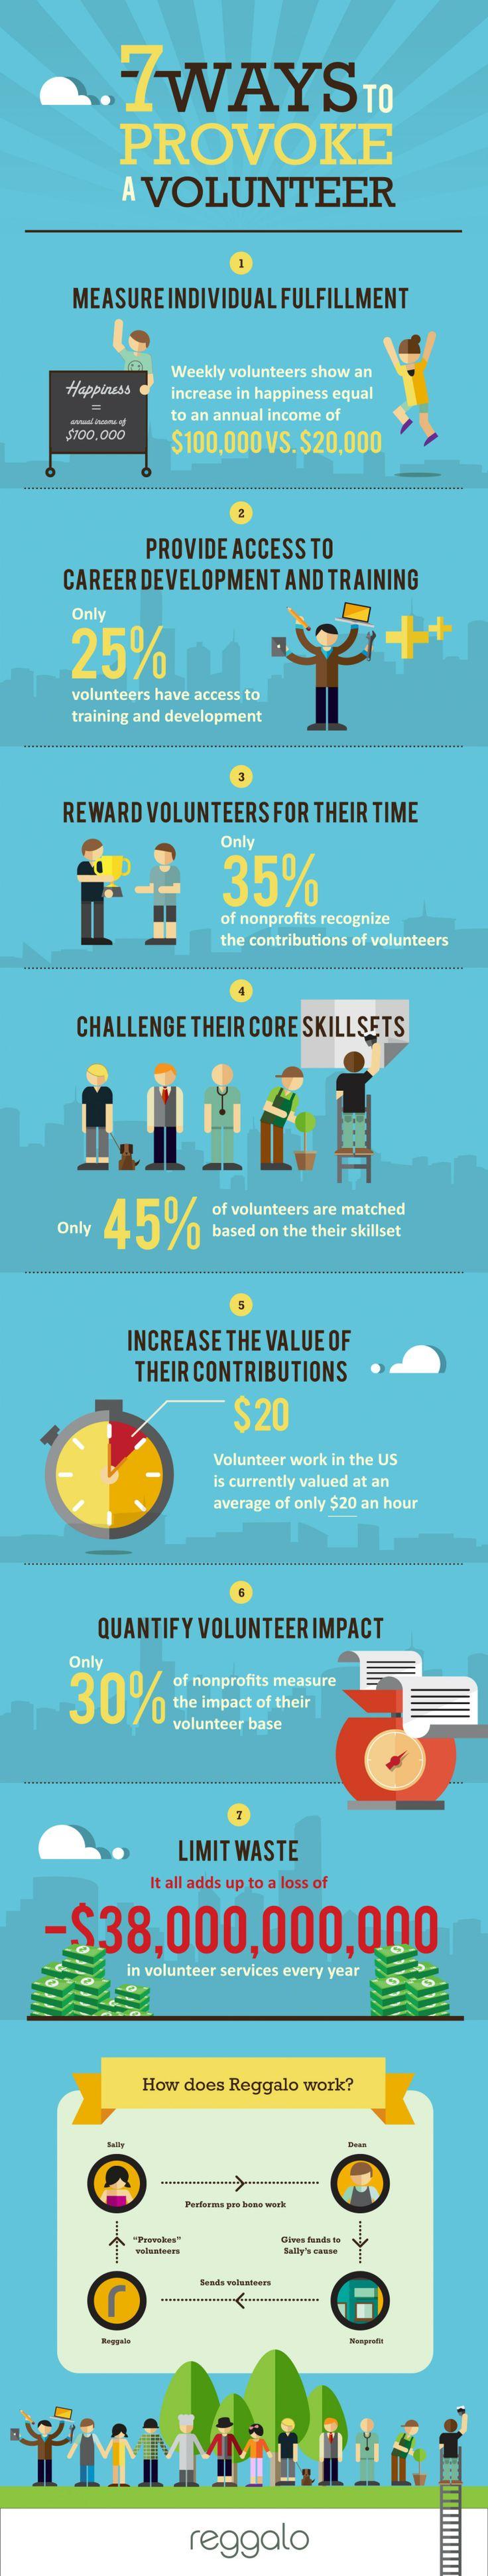 From Tetuko Hanggoro - Infographic - 7 Ways To Provoke (or inspire) a Volunteer